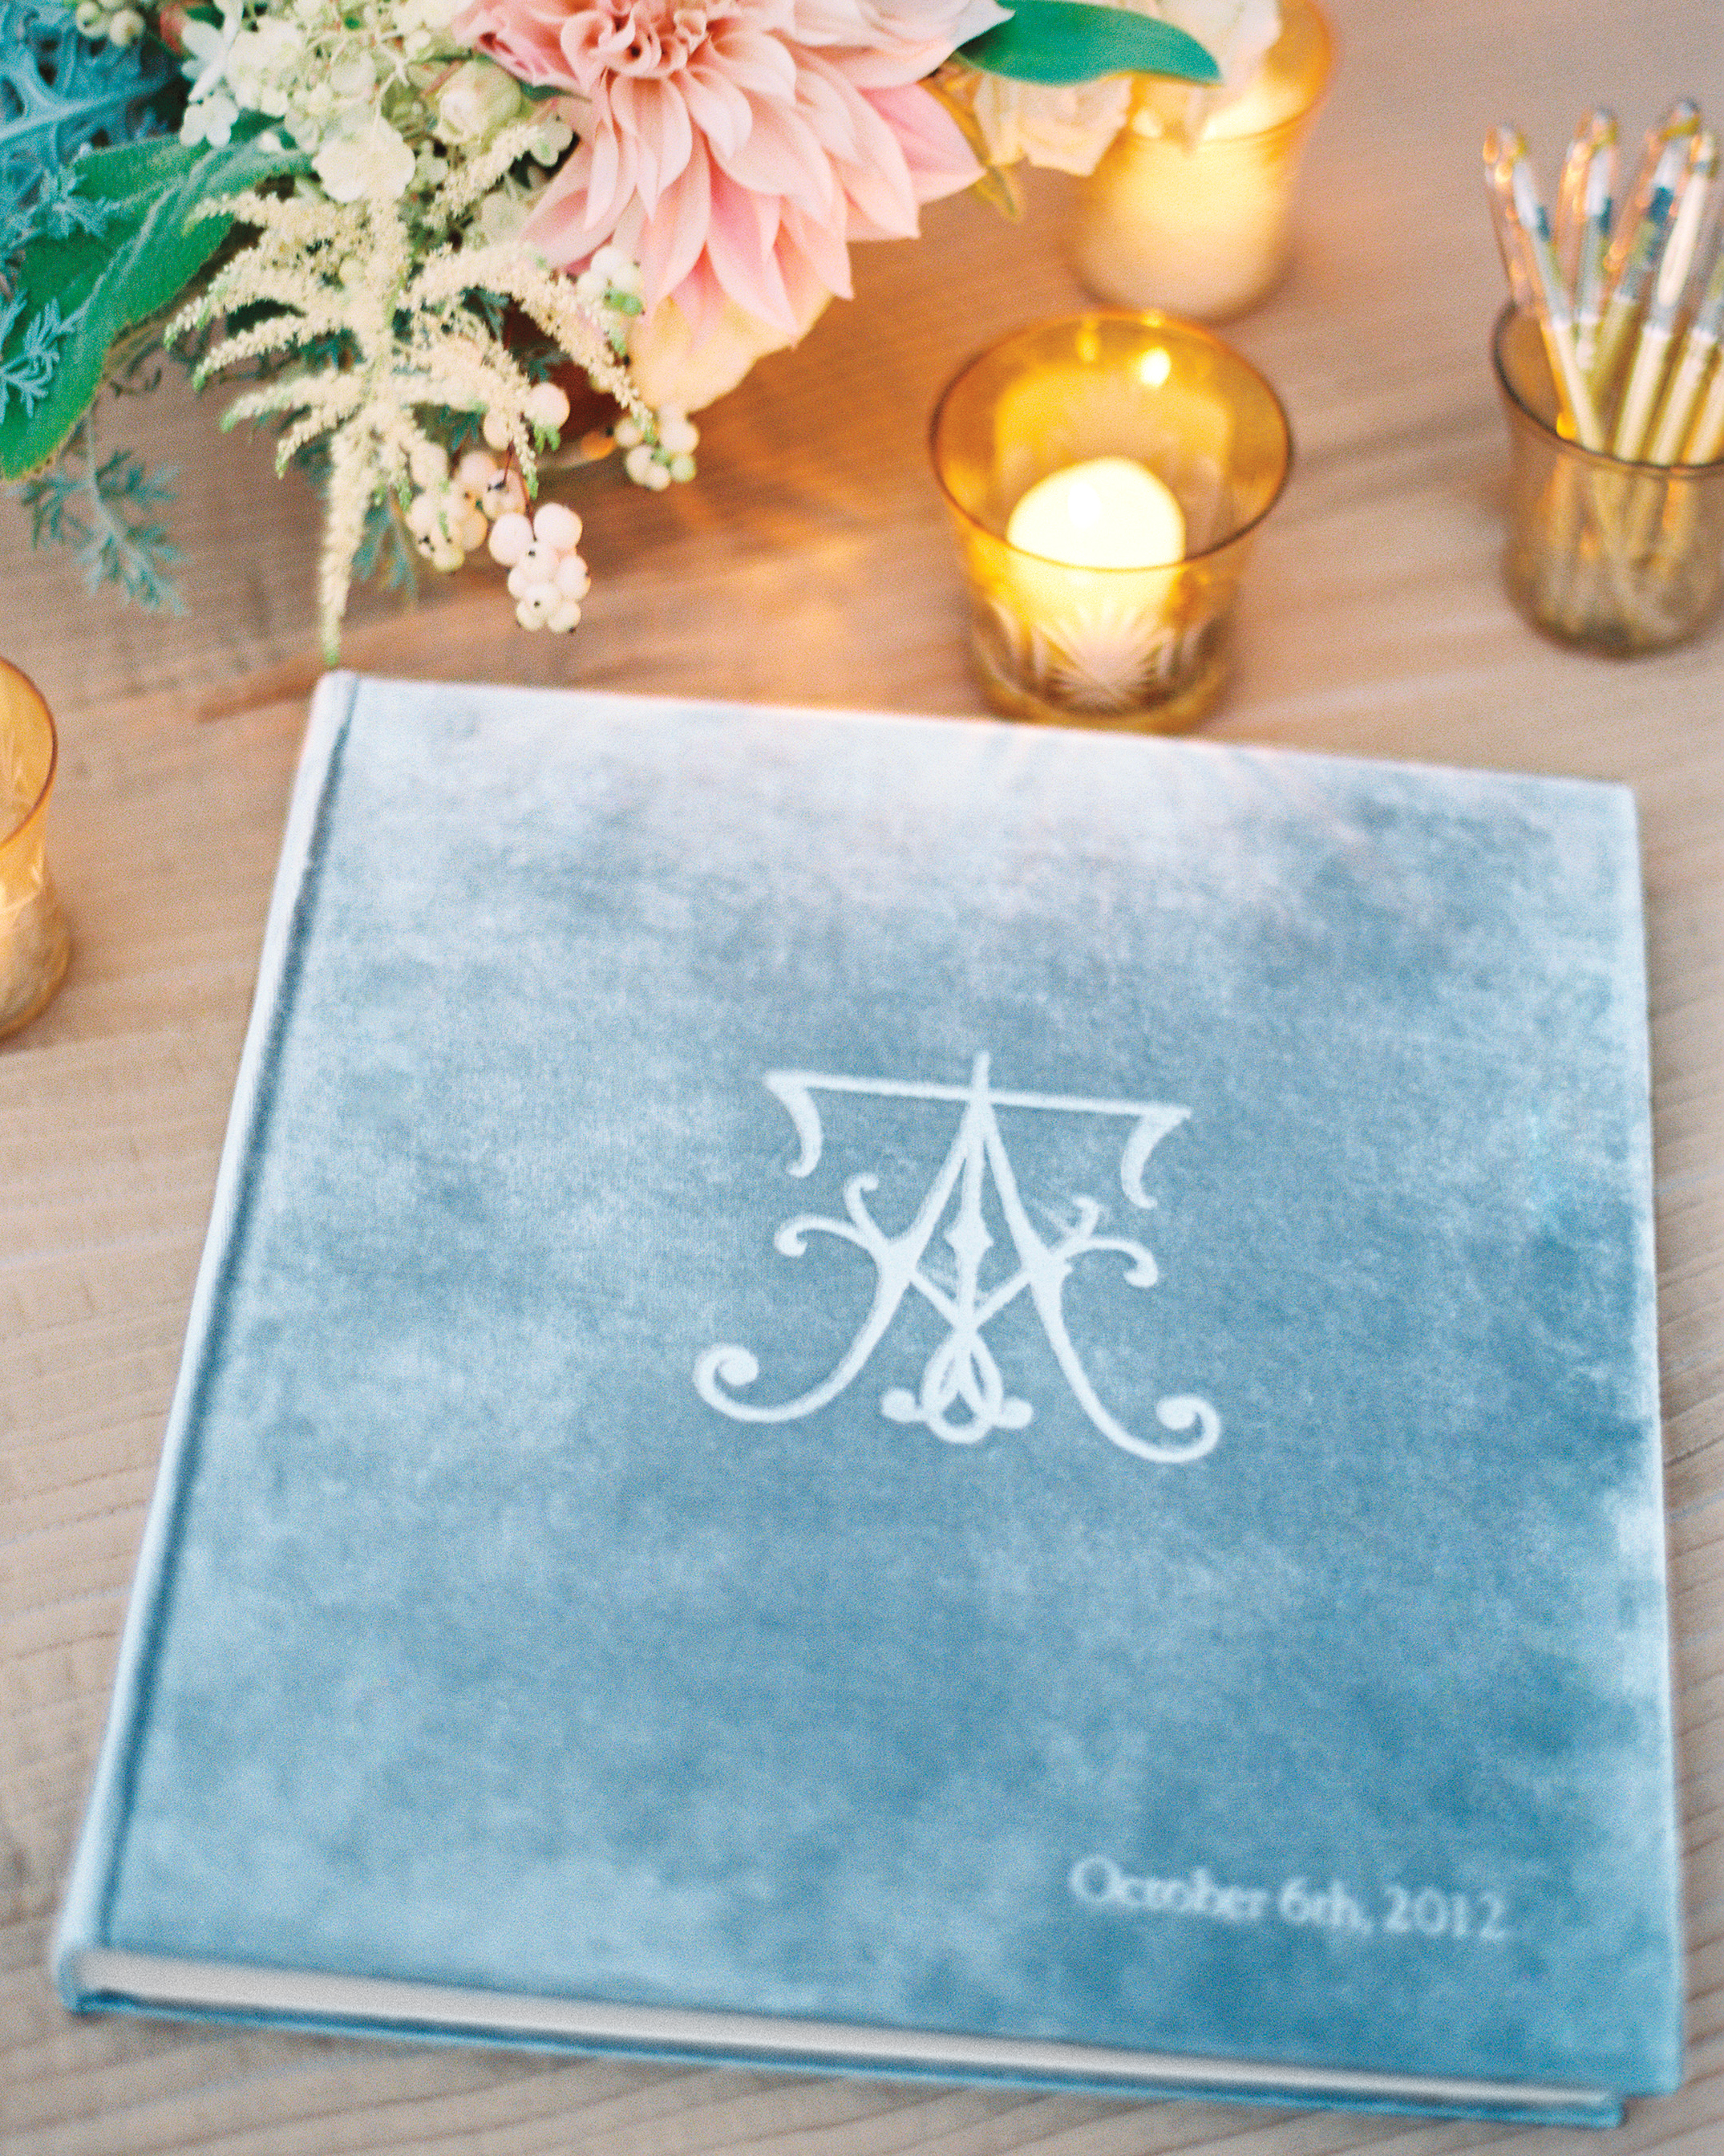 guestbook-votive-candle-flower-004885-r-016-mwds110148.jpg